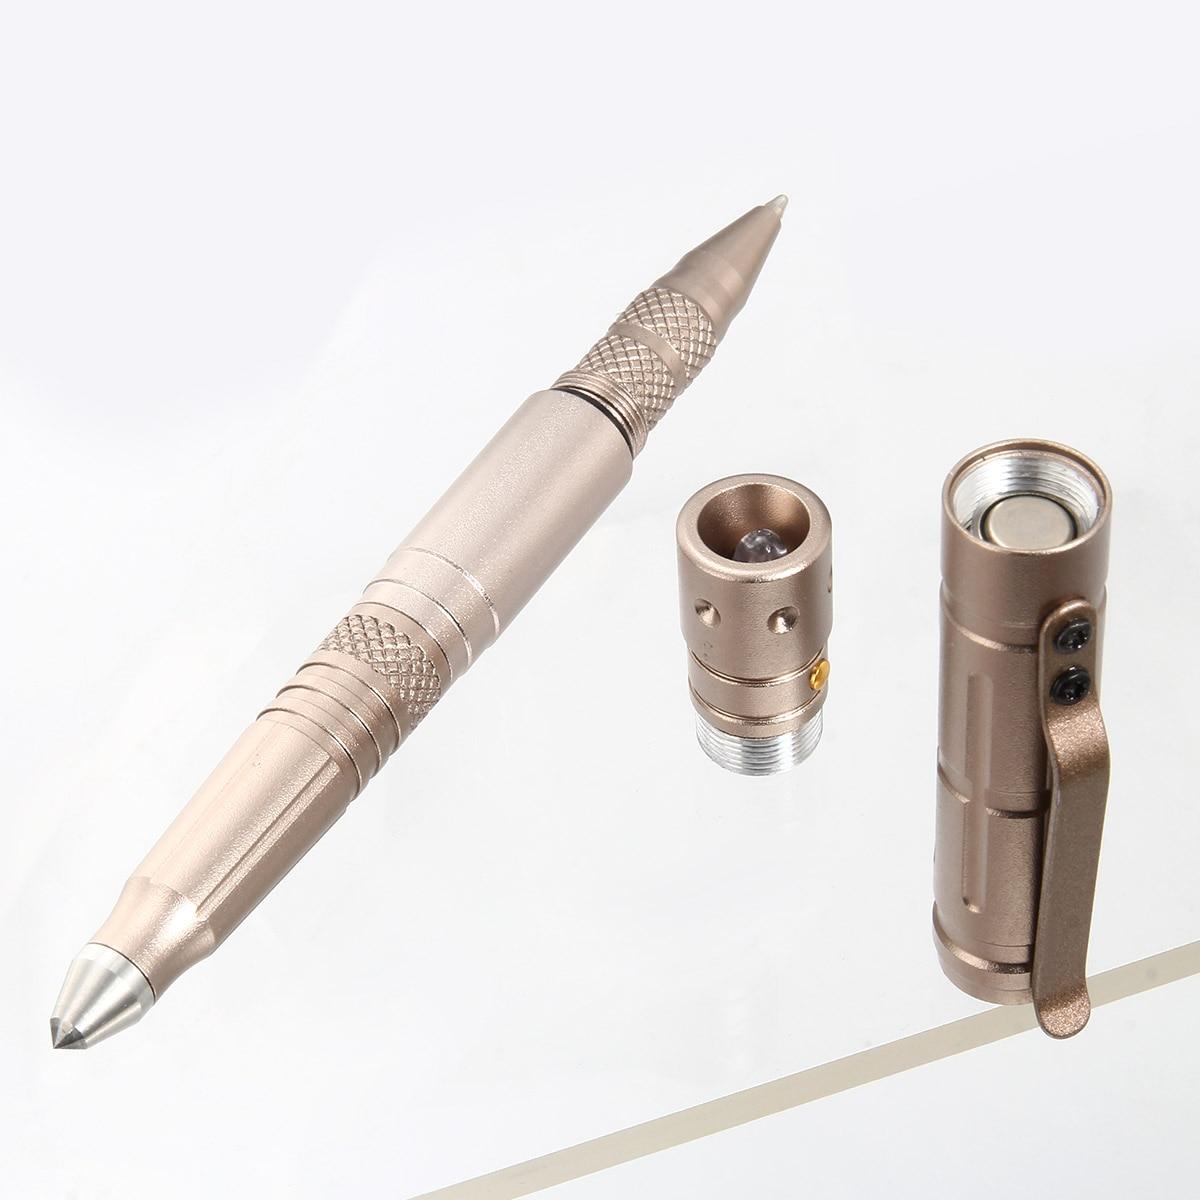 Multi-function Tactical Pen Survival Military LED Flashlight Glass Breaker Self Defense Tool Ballpoint Pens QJY99